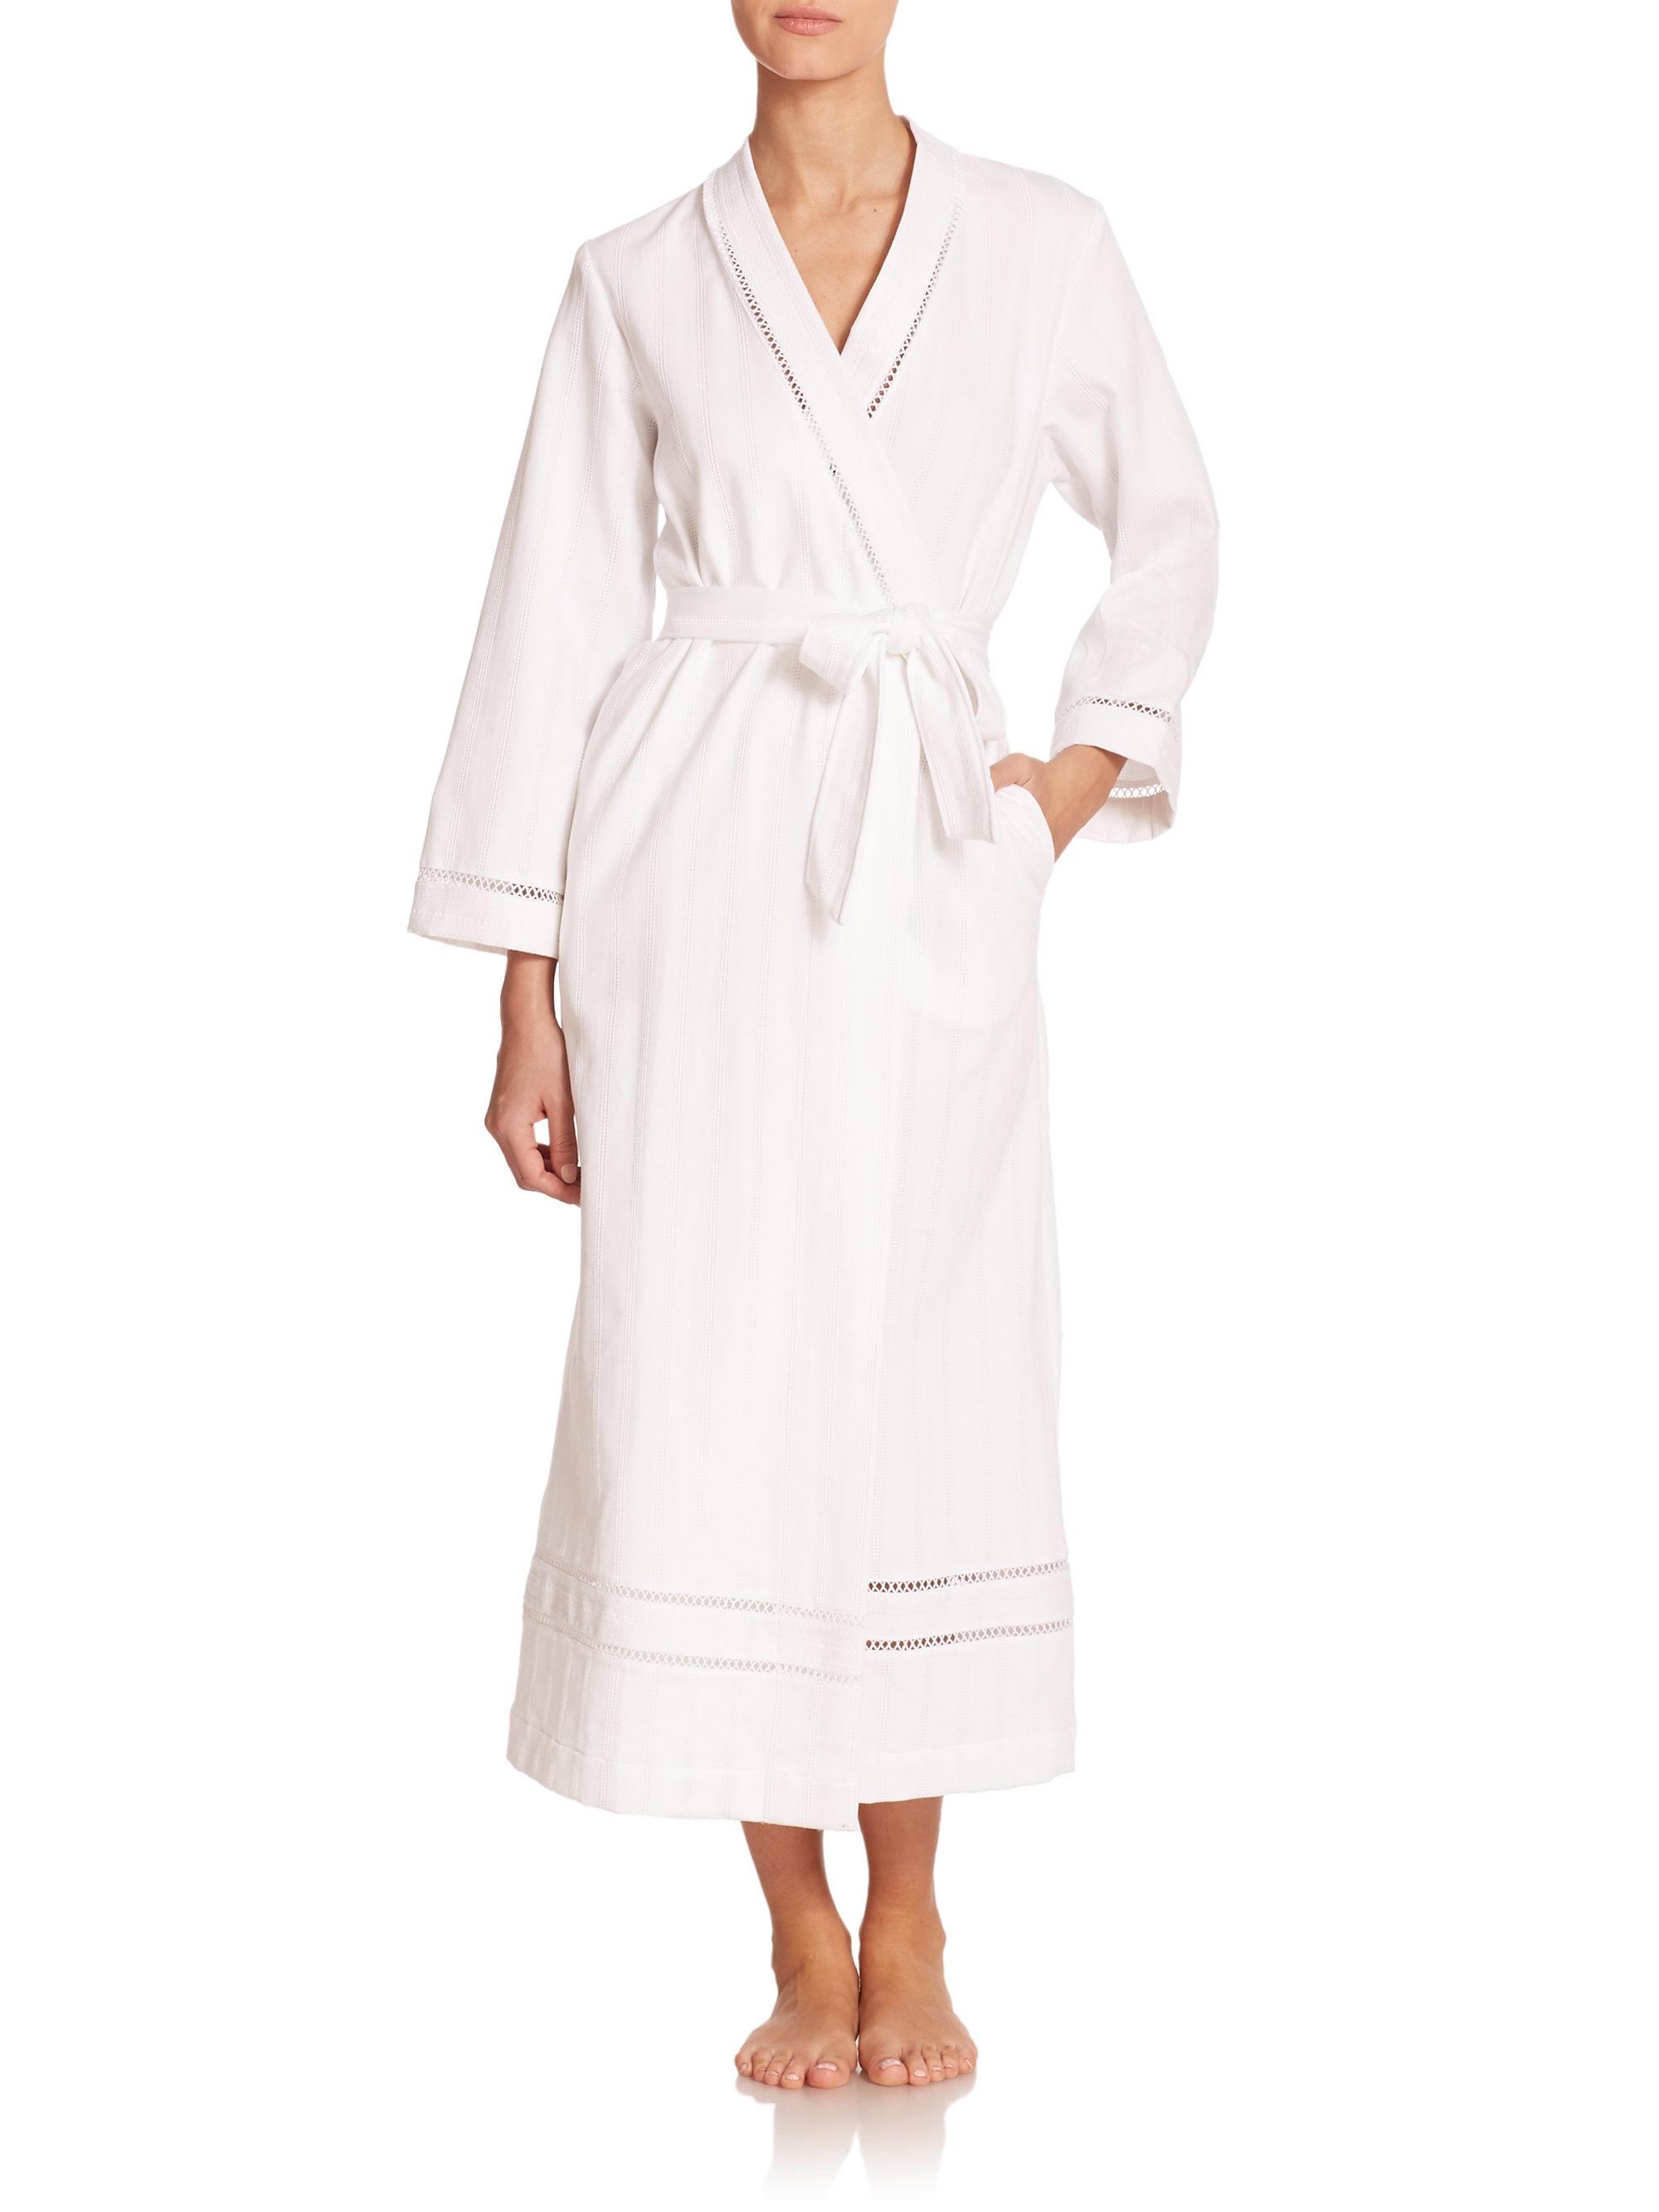 oscar de la renta luxe spa long cotton robe in white lyst. Black Bedroom Furniture Sets. Home Design Ideas